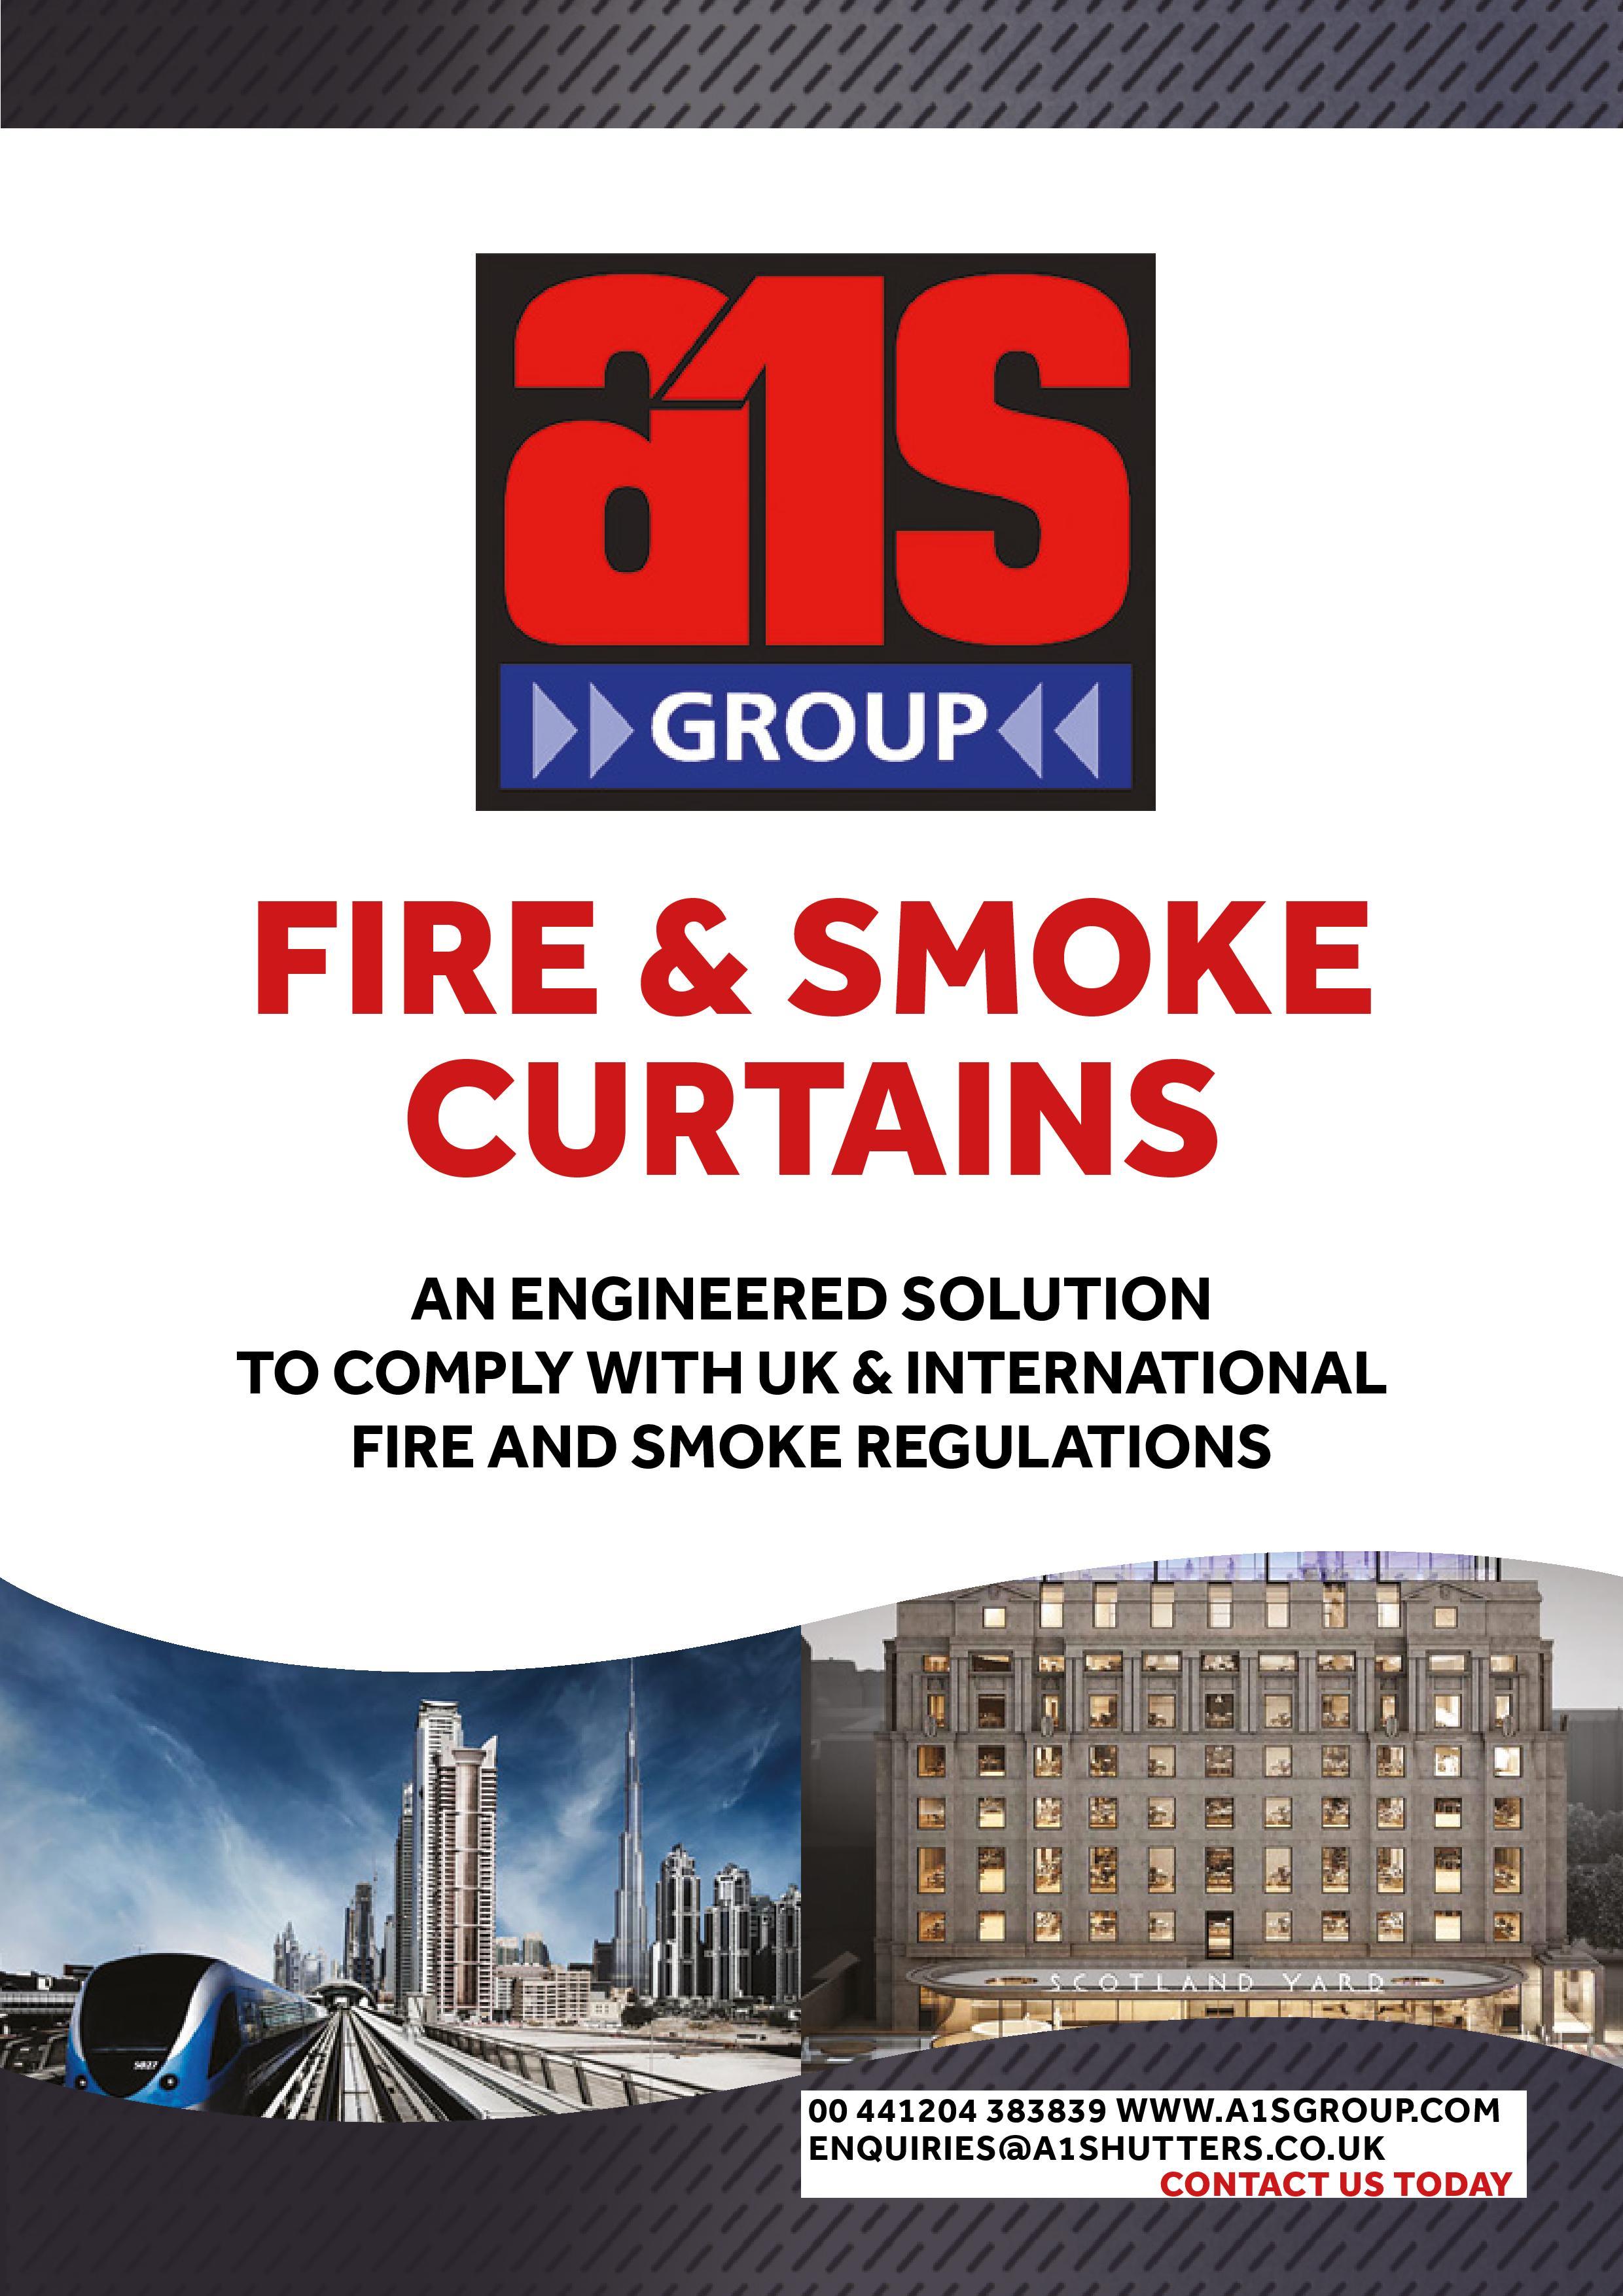 Fire Curtain Brochure 2018-page-001.jpg